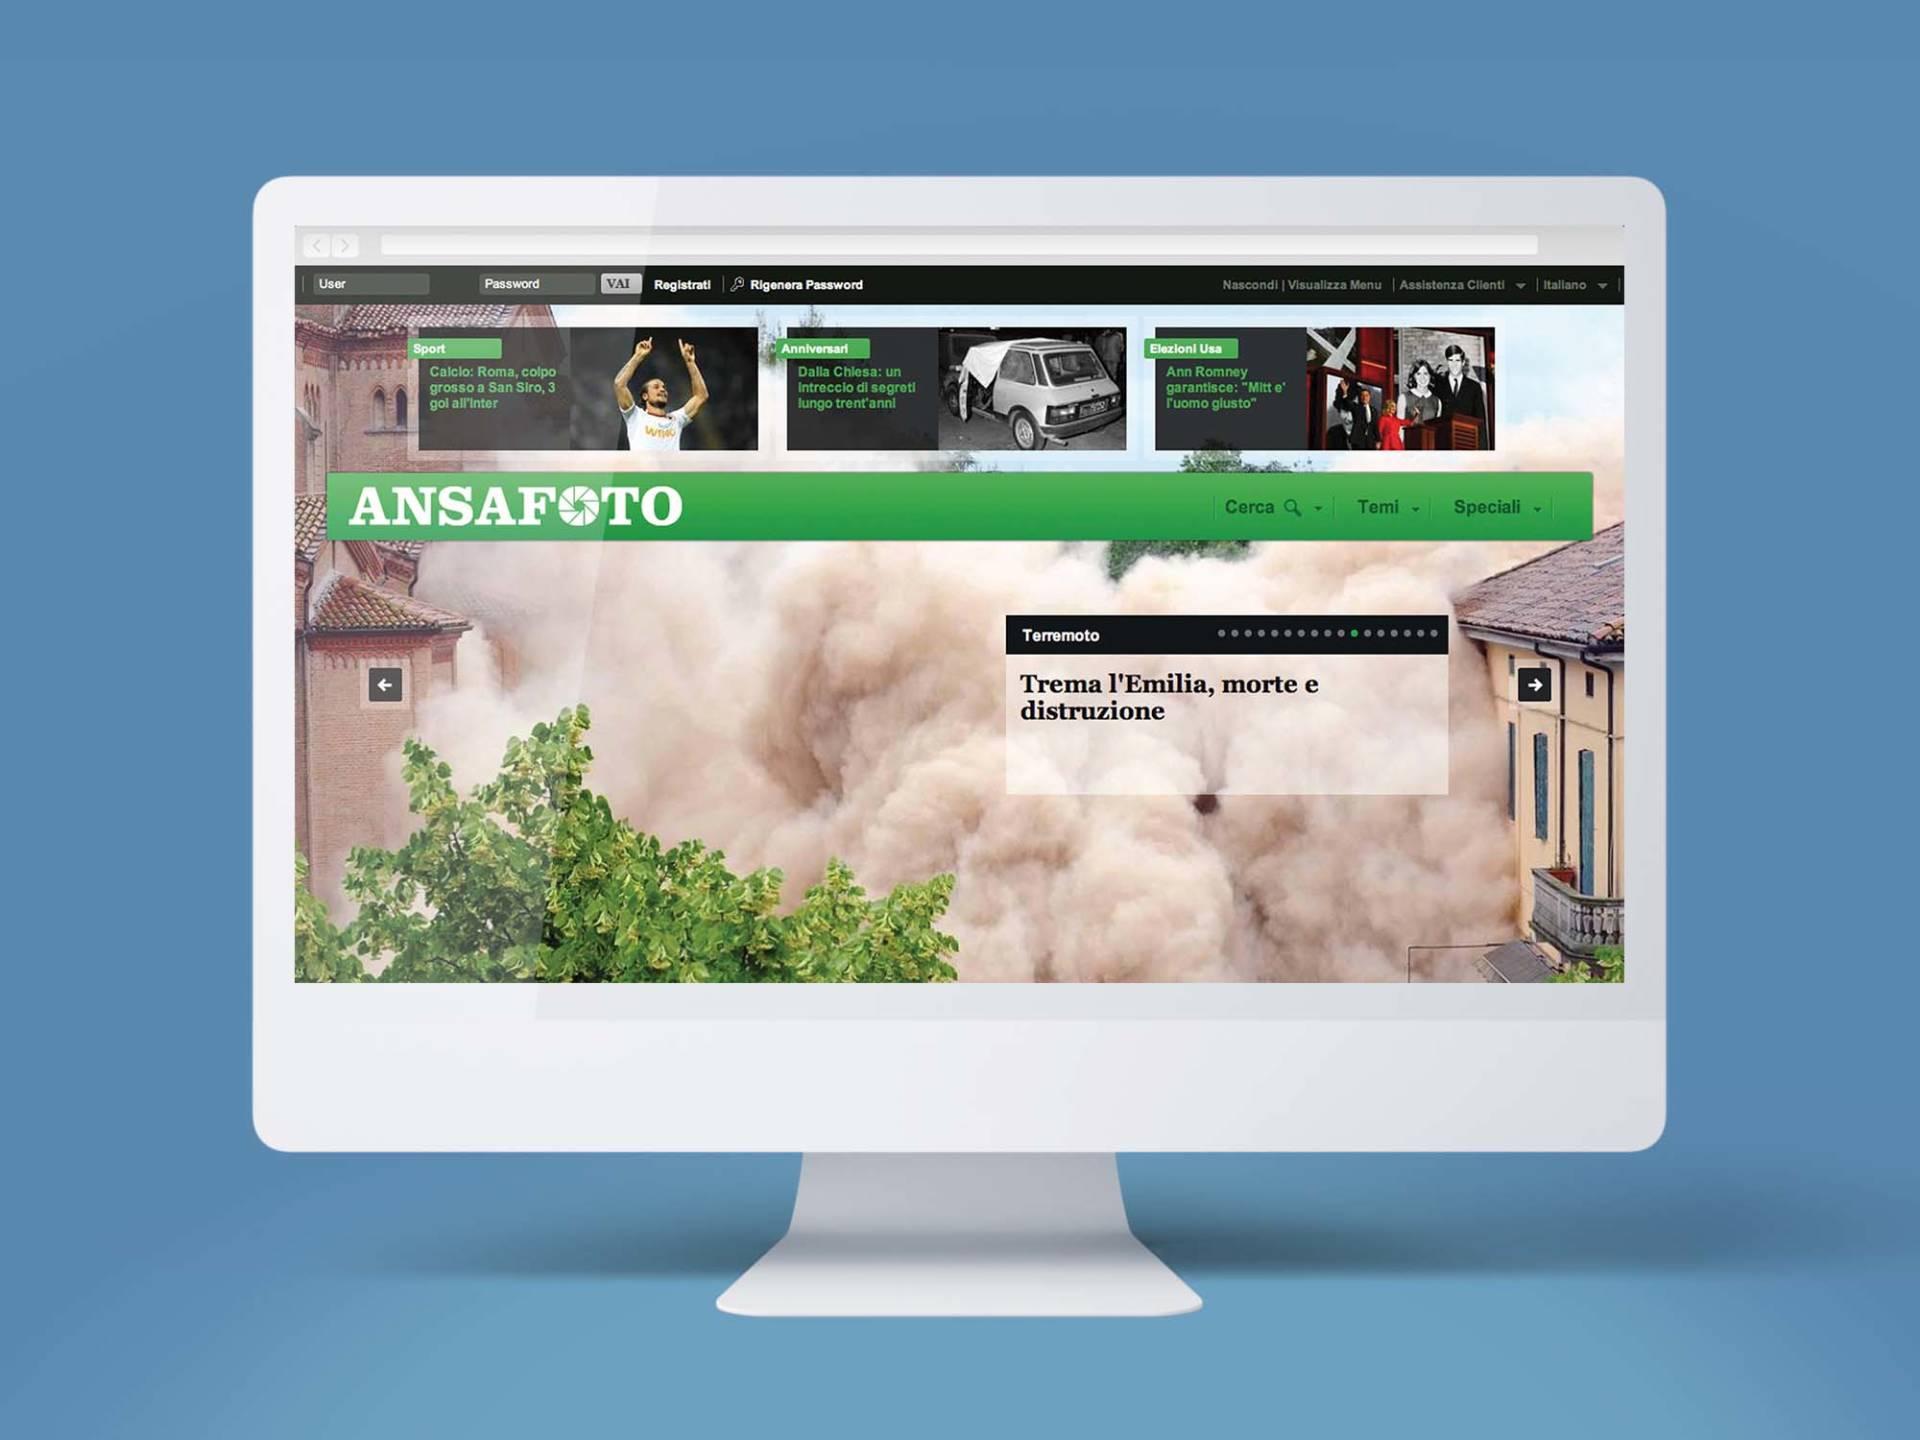 AnsaFoto_01_Wenceslau_News_Design